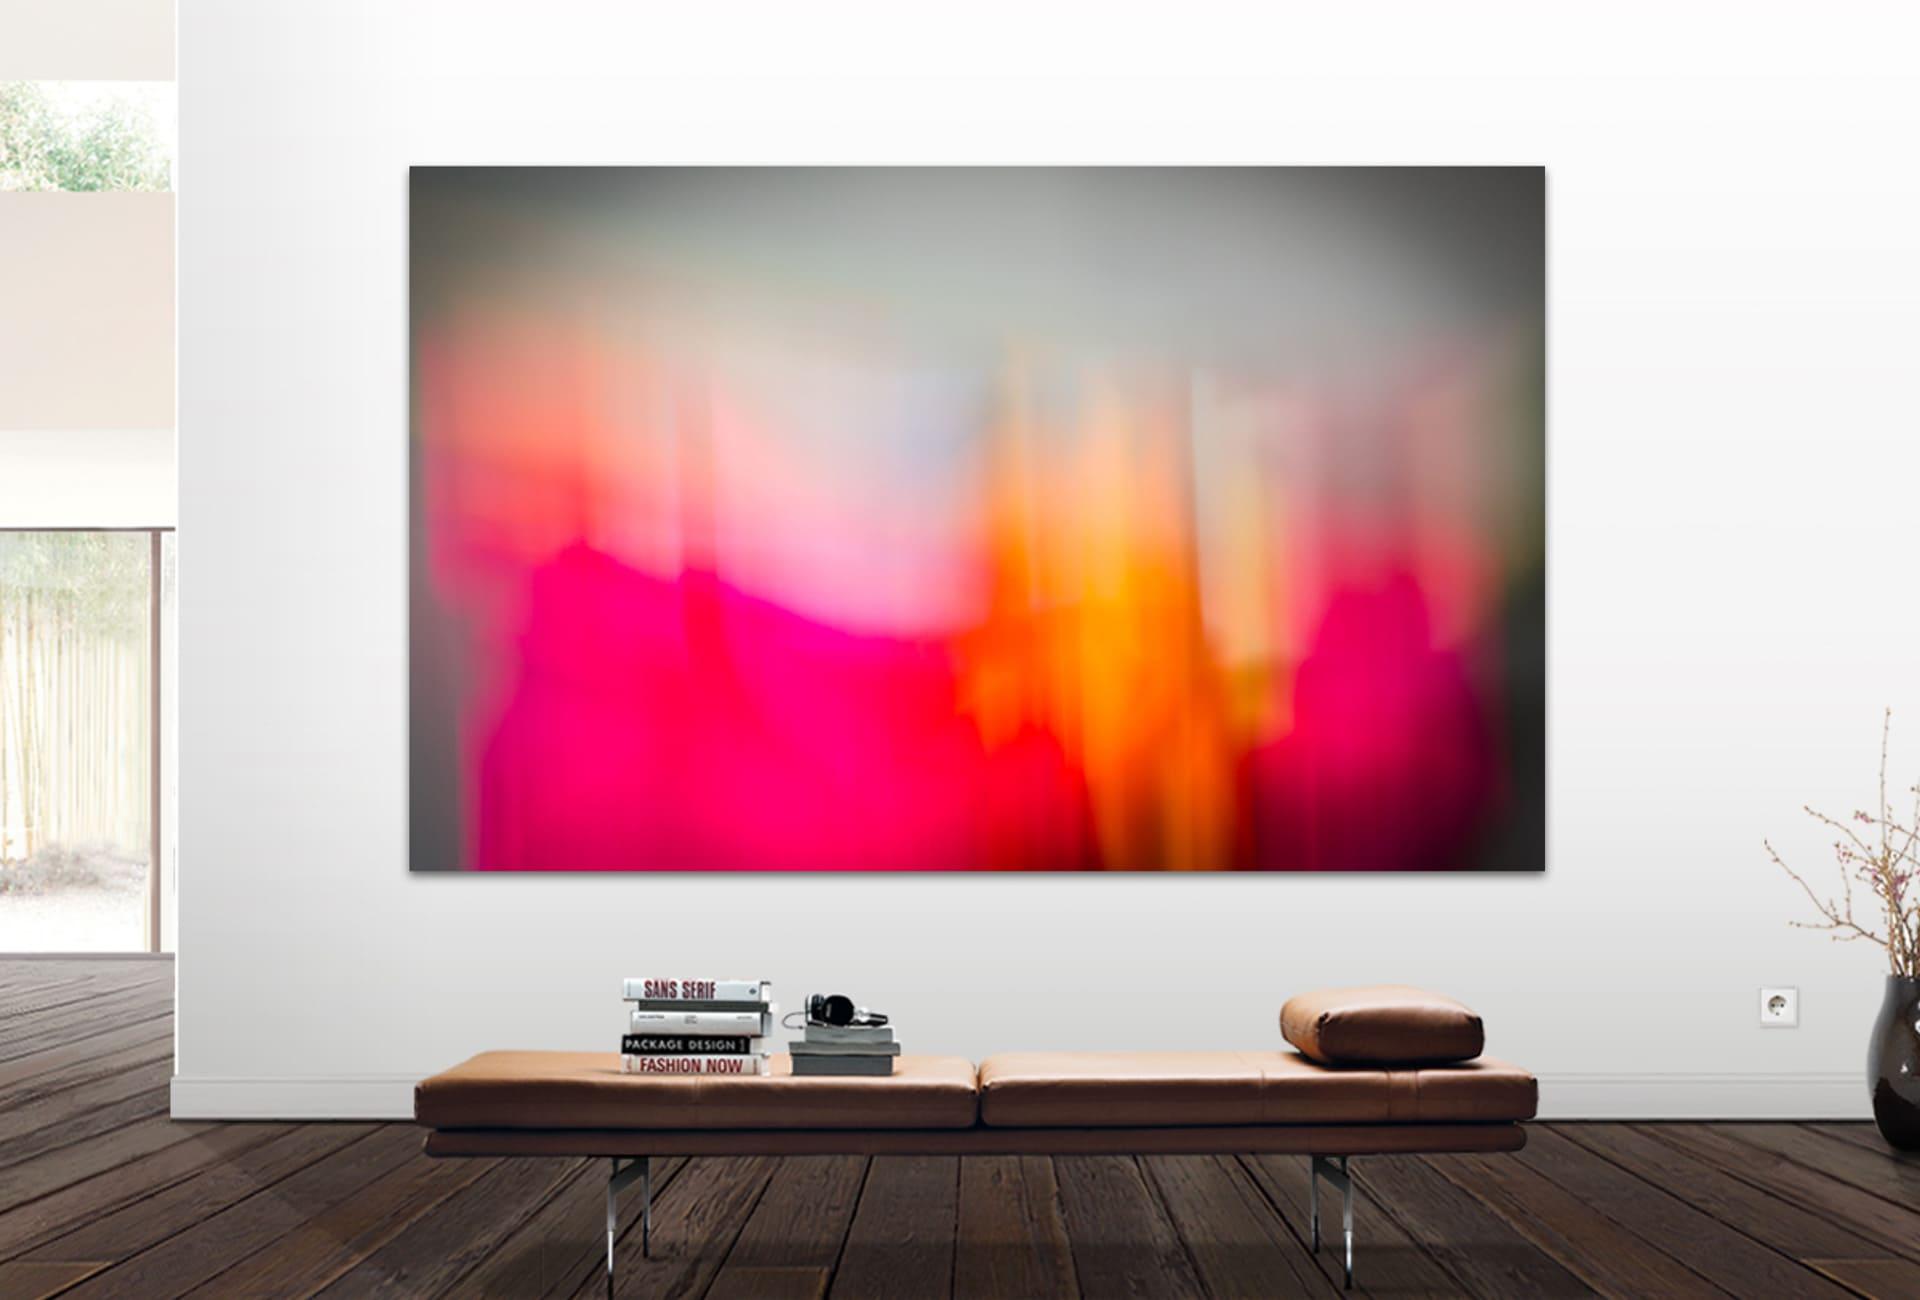 simoarts-com-simone-kessler-fotokunst-nuernberg-koh-phi-phi-abstract-motiv01-milieu